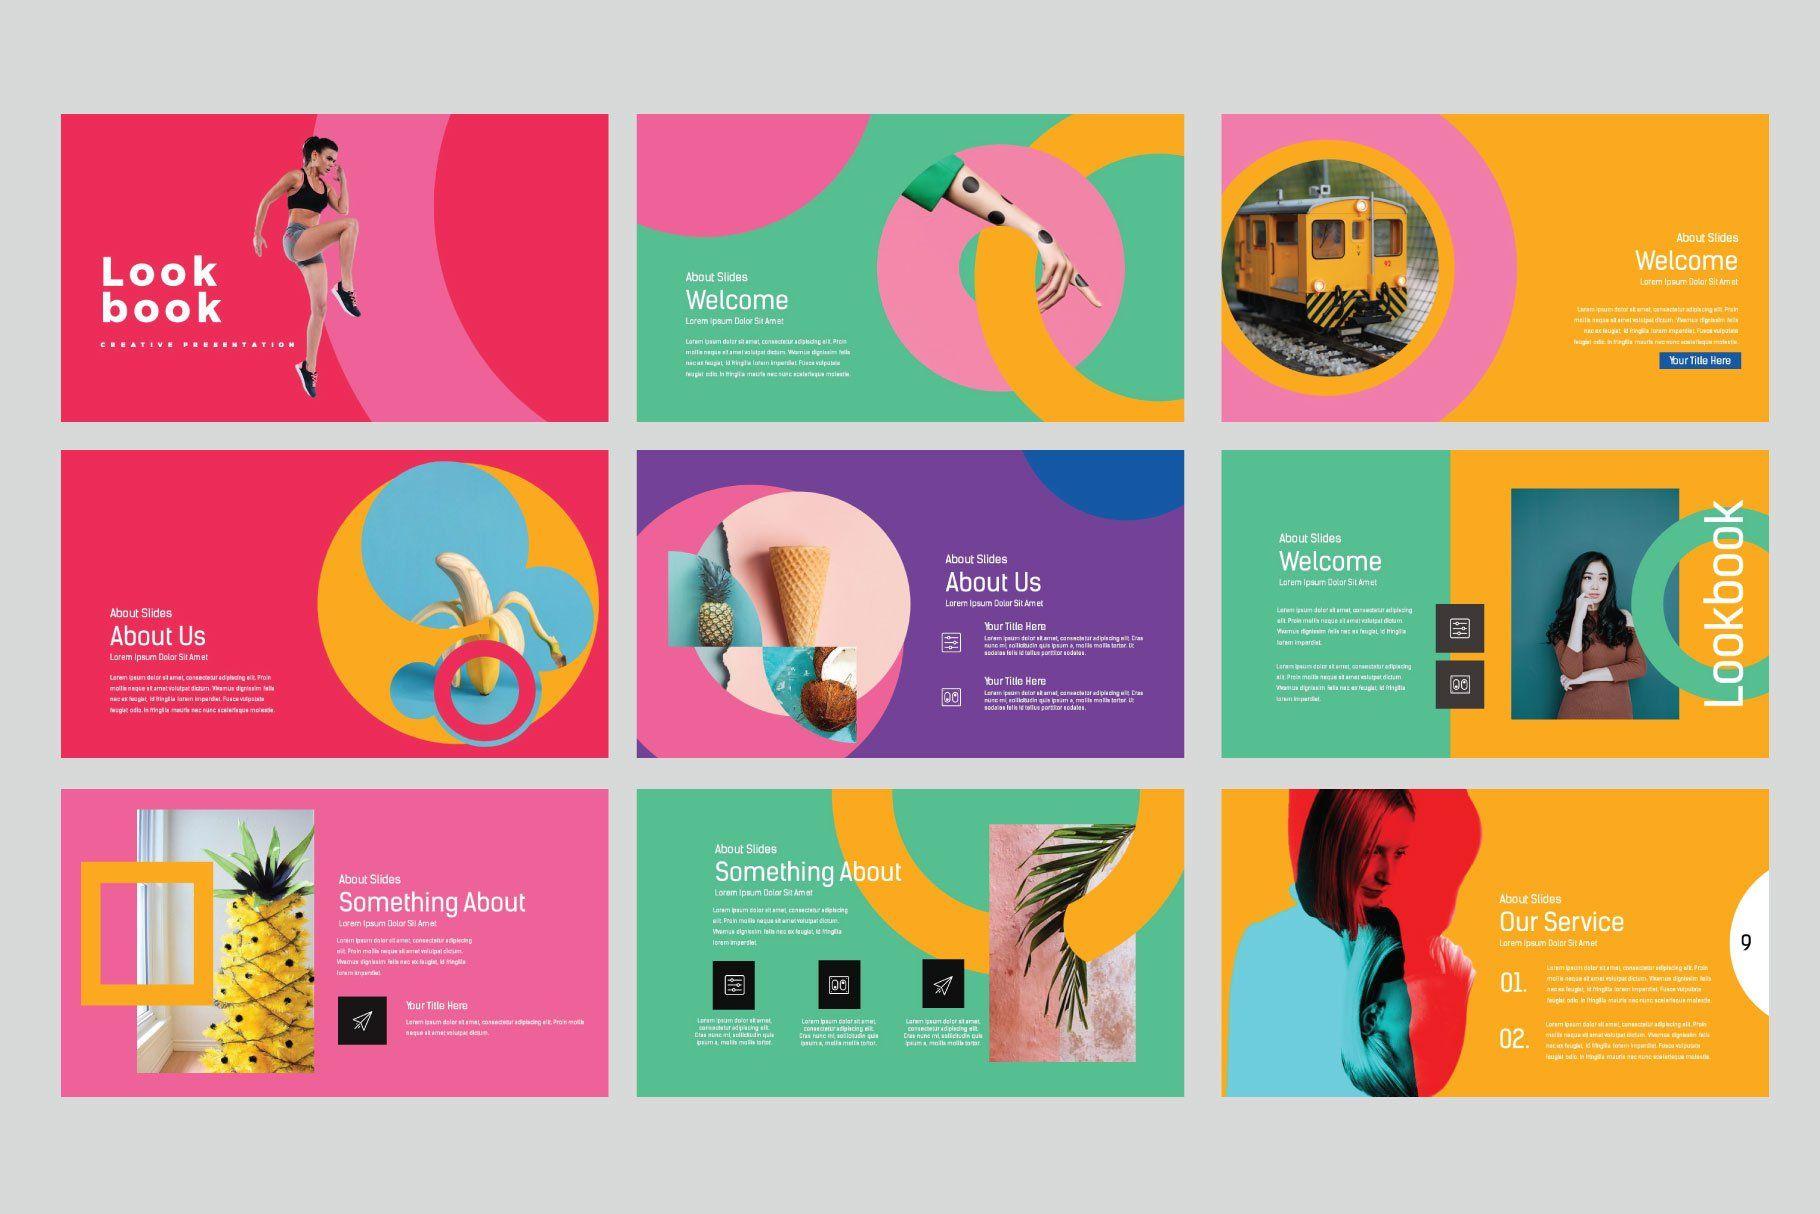 Lookbook Pastel Powerpoint (488976) | Powerpoint | Design Bundles